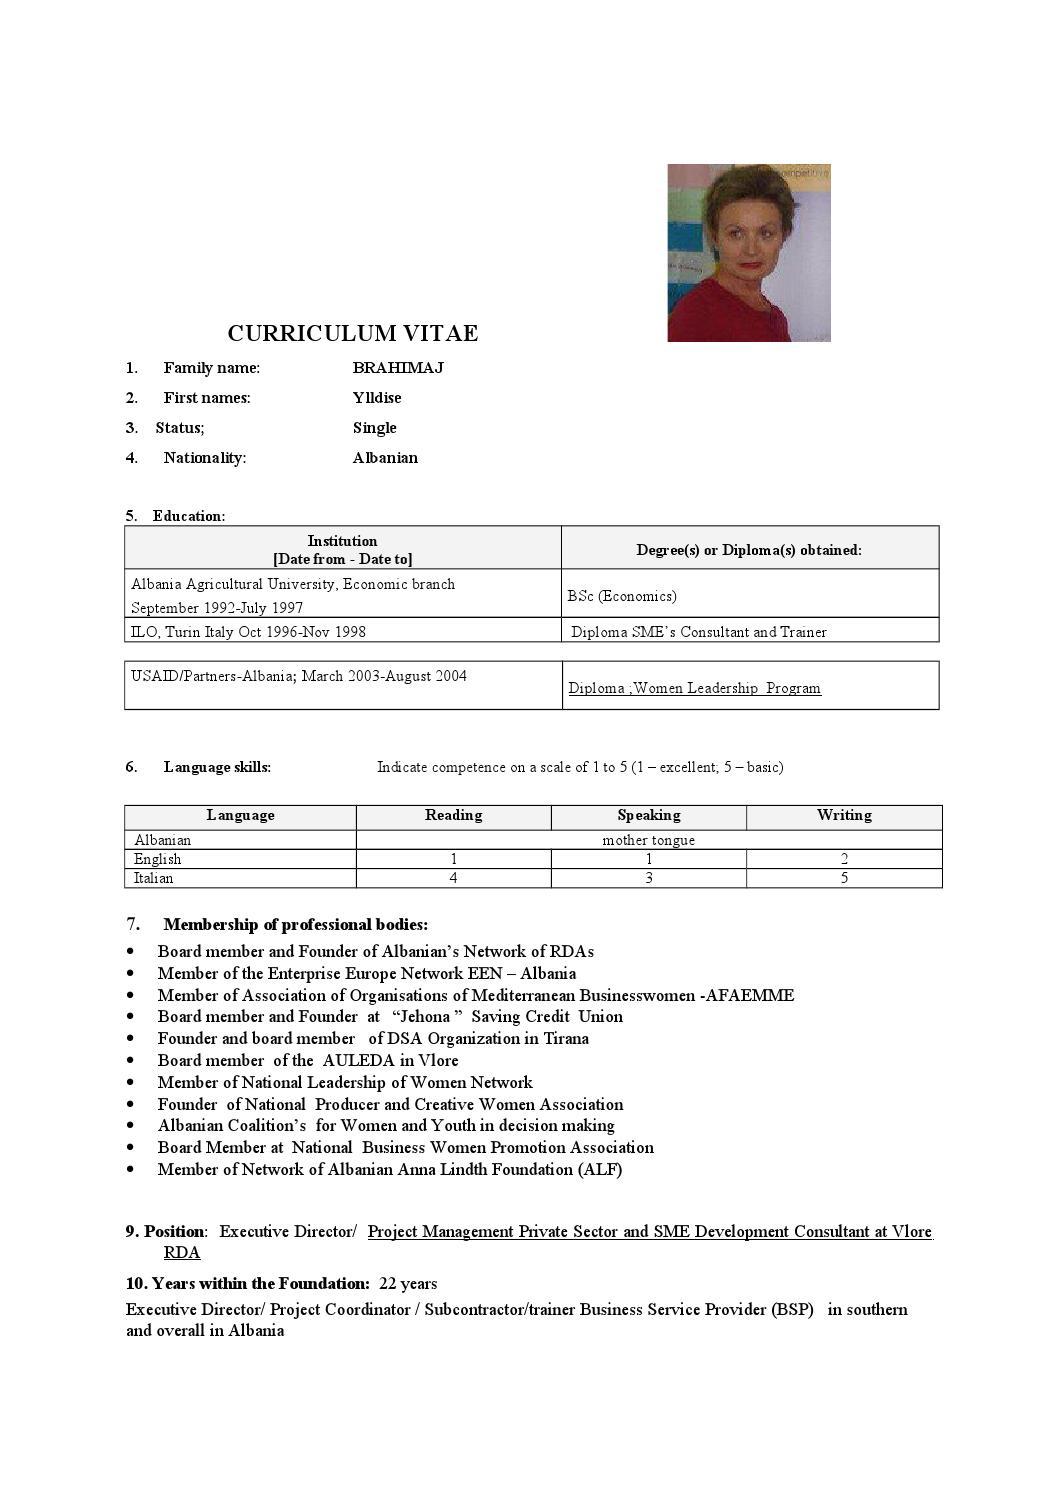 cv ylldise brahimi eu format 2015 by ylldise brahimi